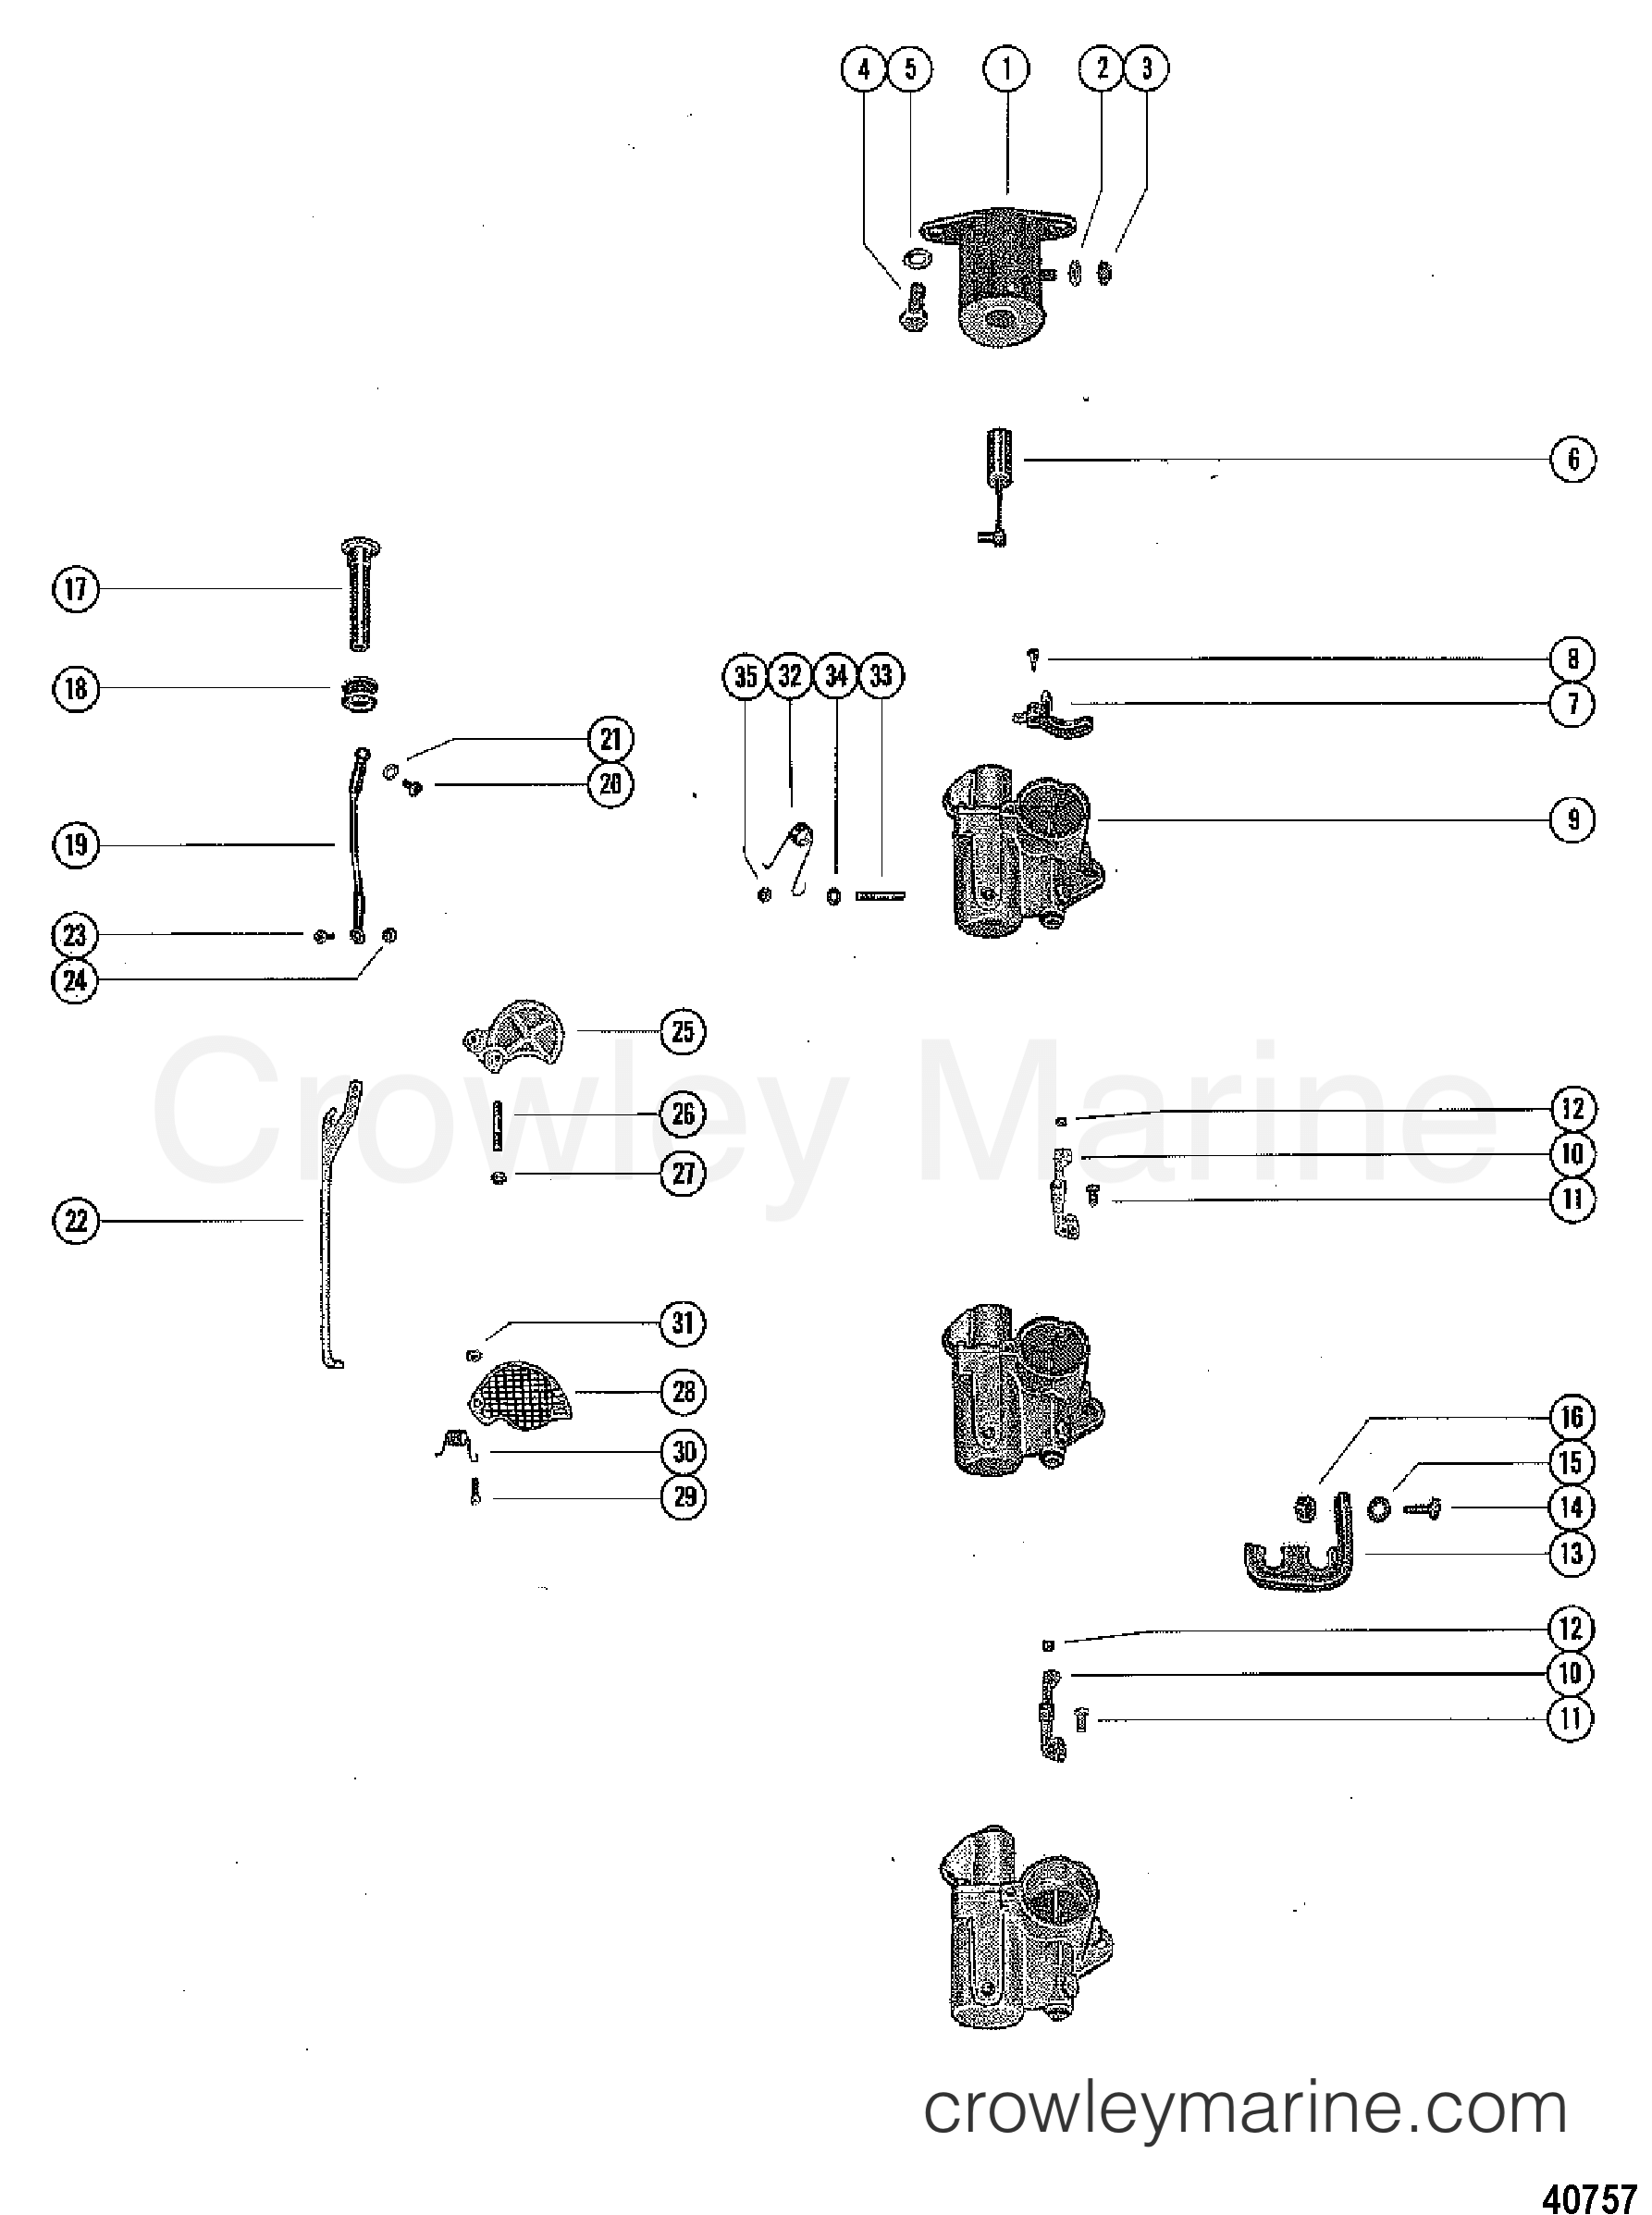 carburetor linkage and choke solenoid - 1976 mercury ... mercury outboard wiring harness color code 1976 mercury outboard diagram